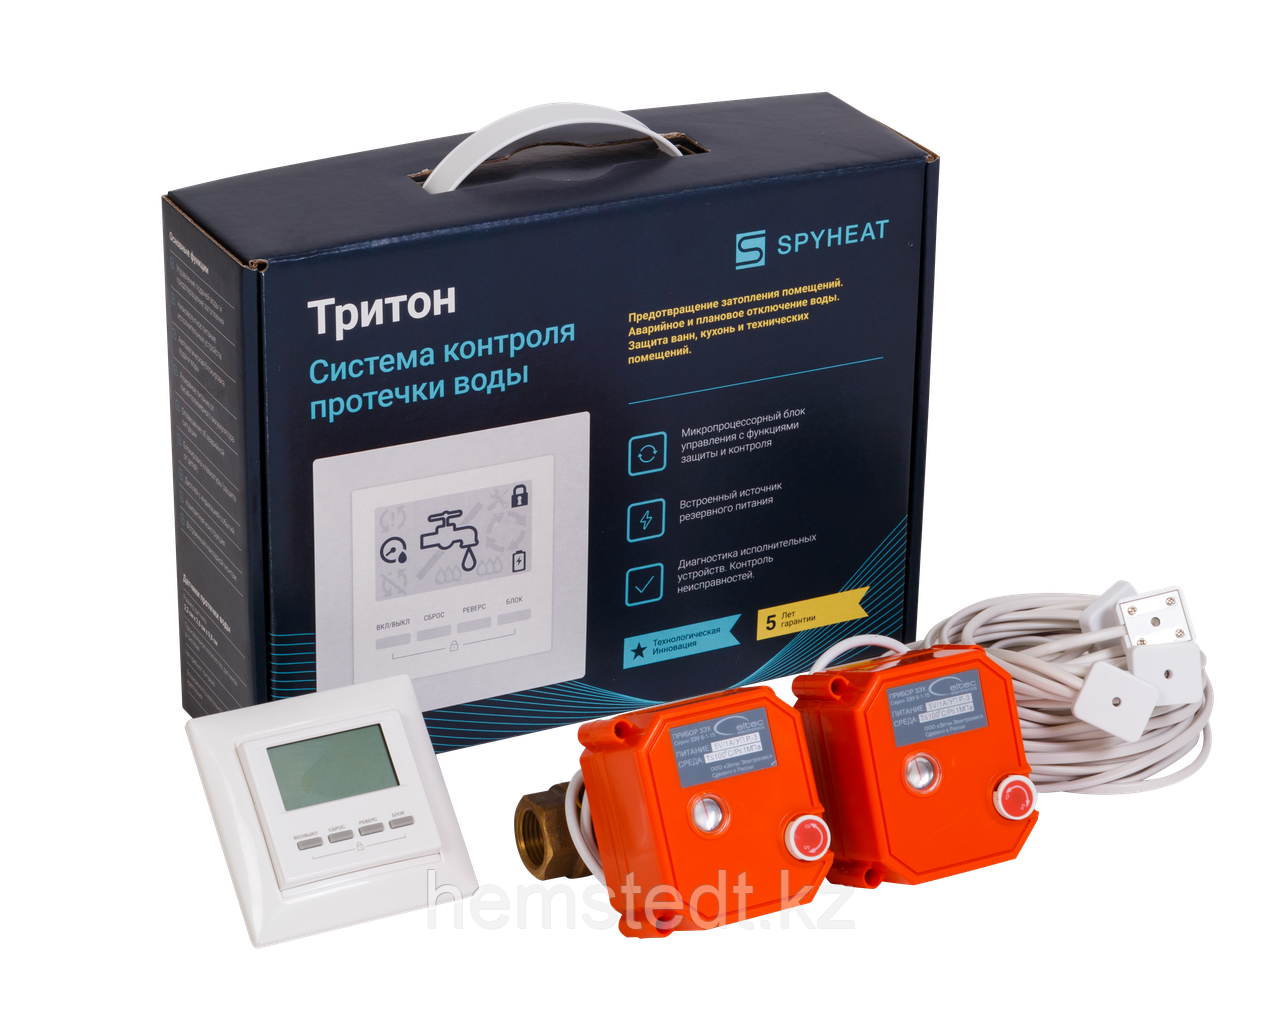 Система защиты протечки воды «Тритон» 3/4'' (2 крана)